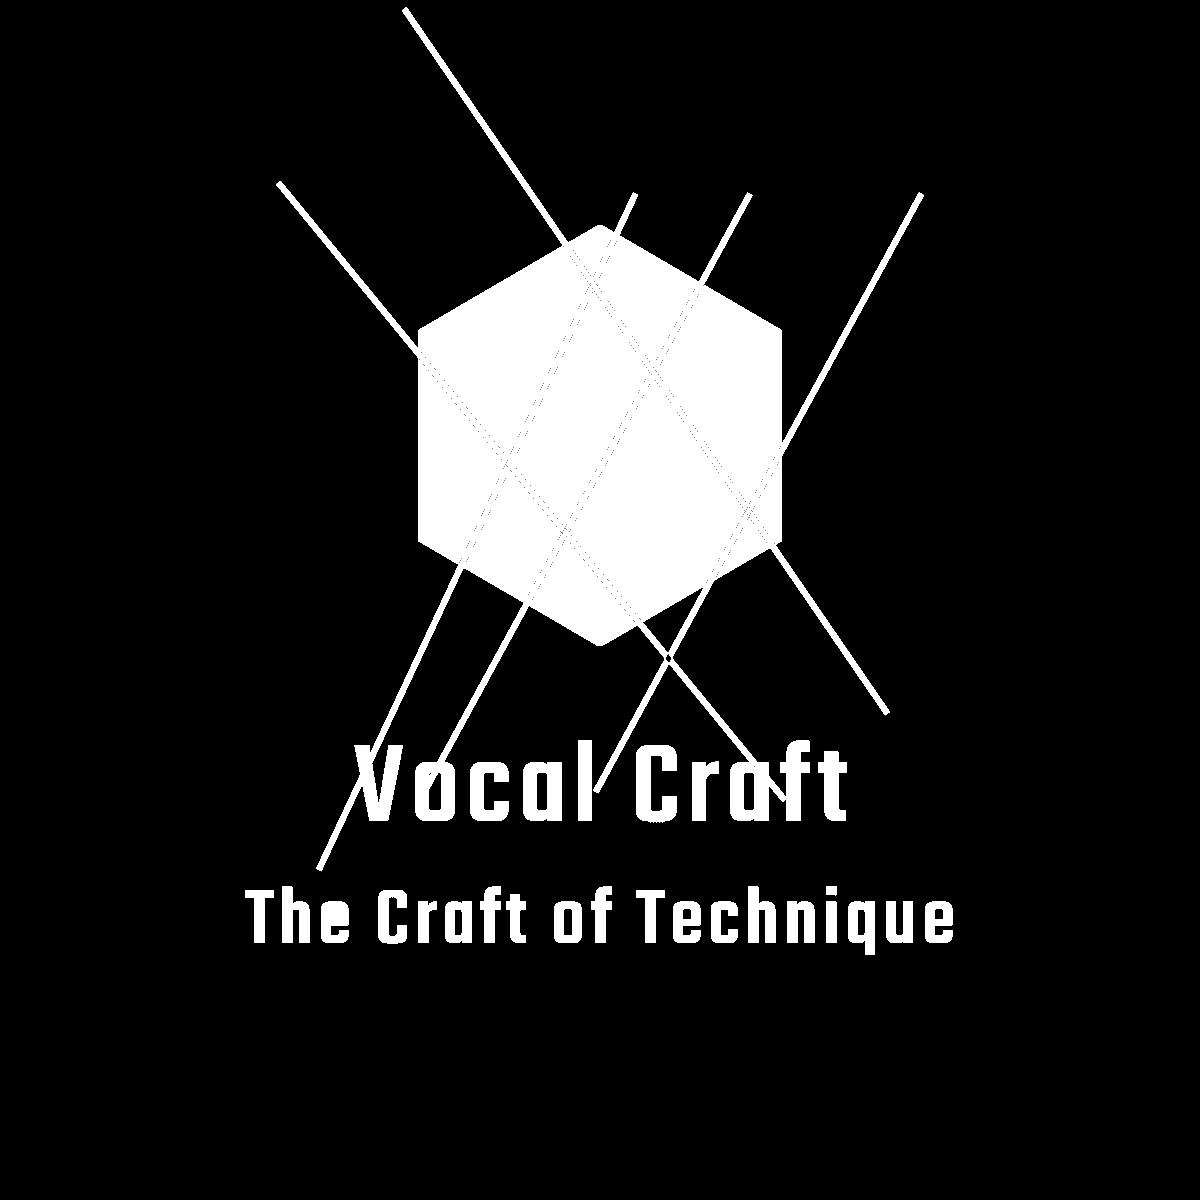 Vocal Craft